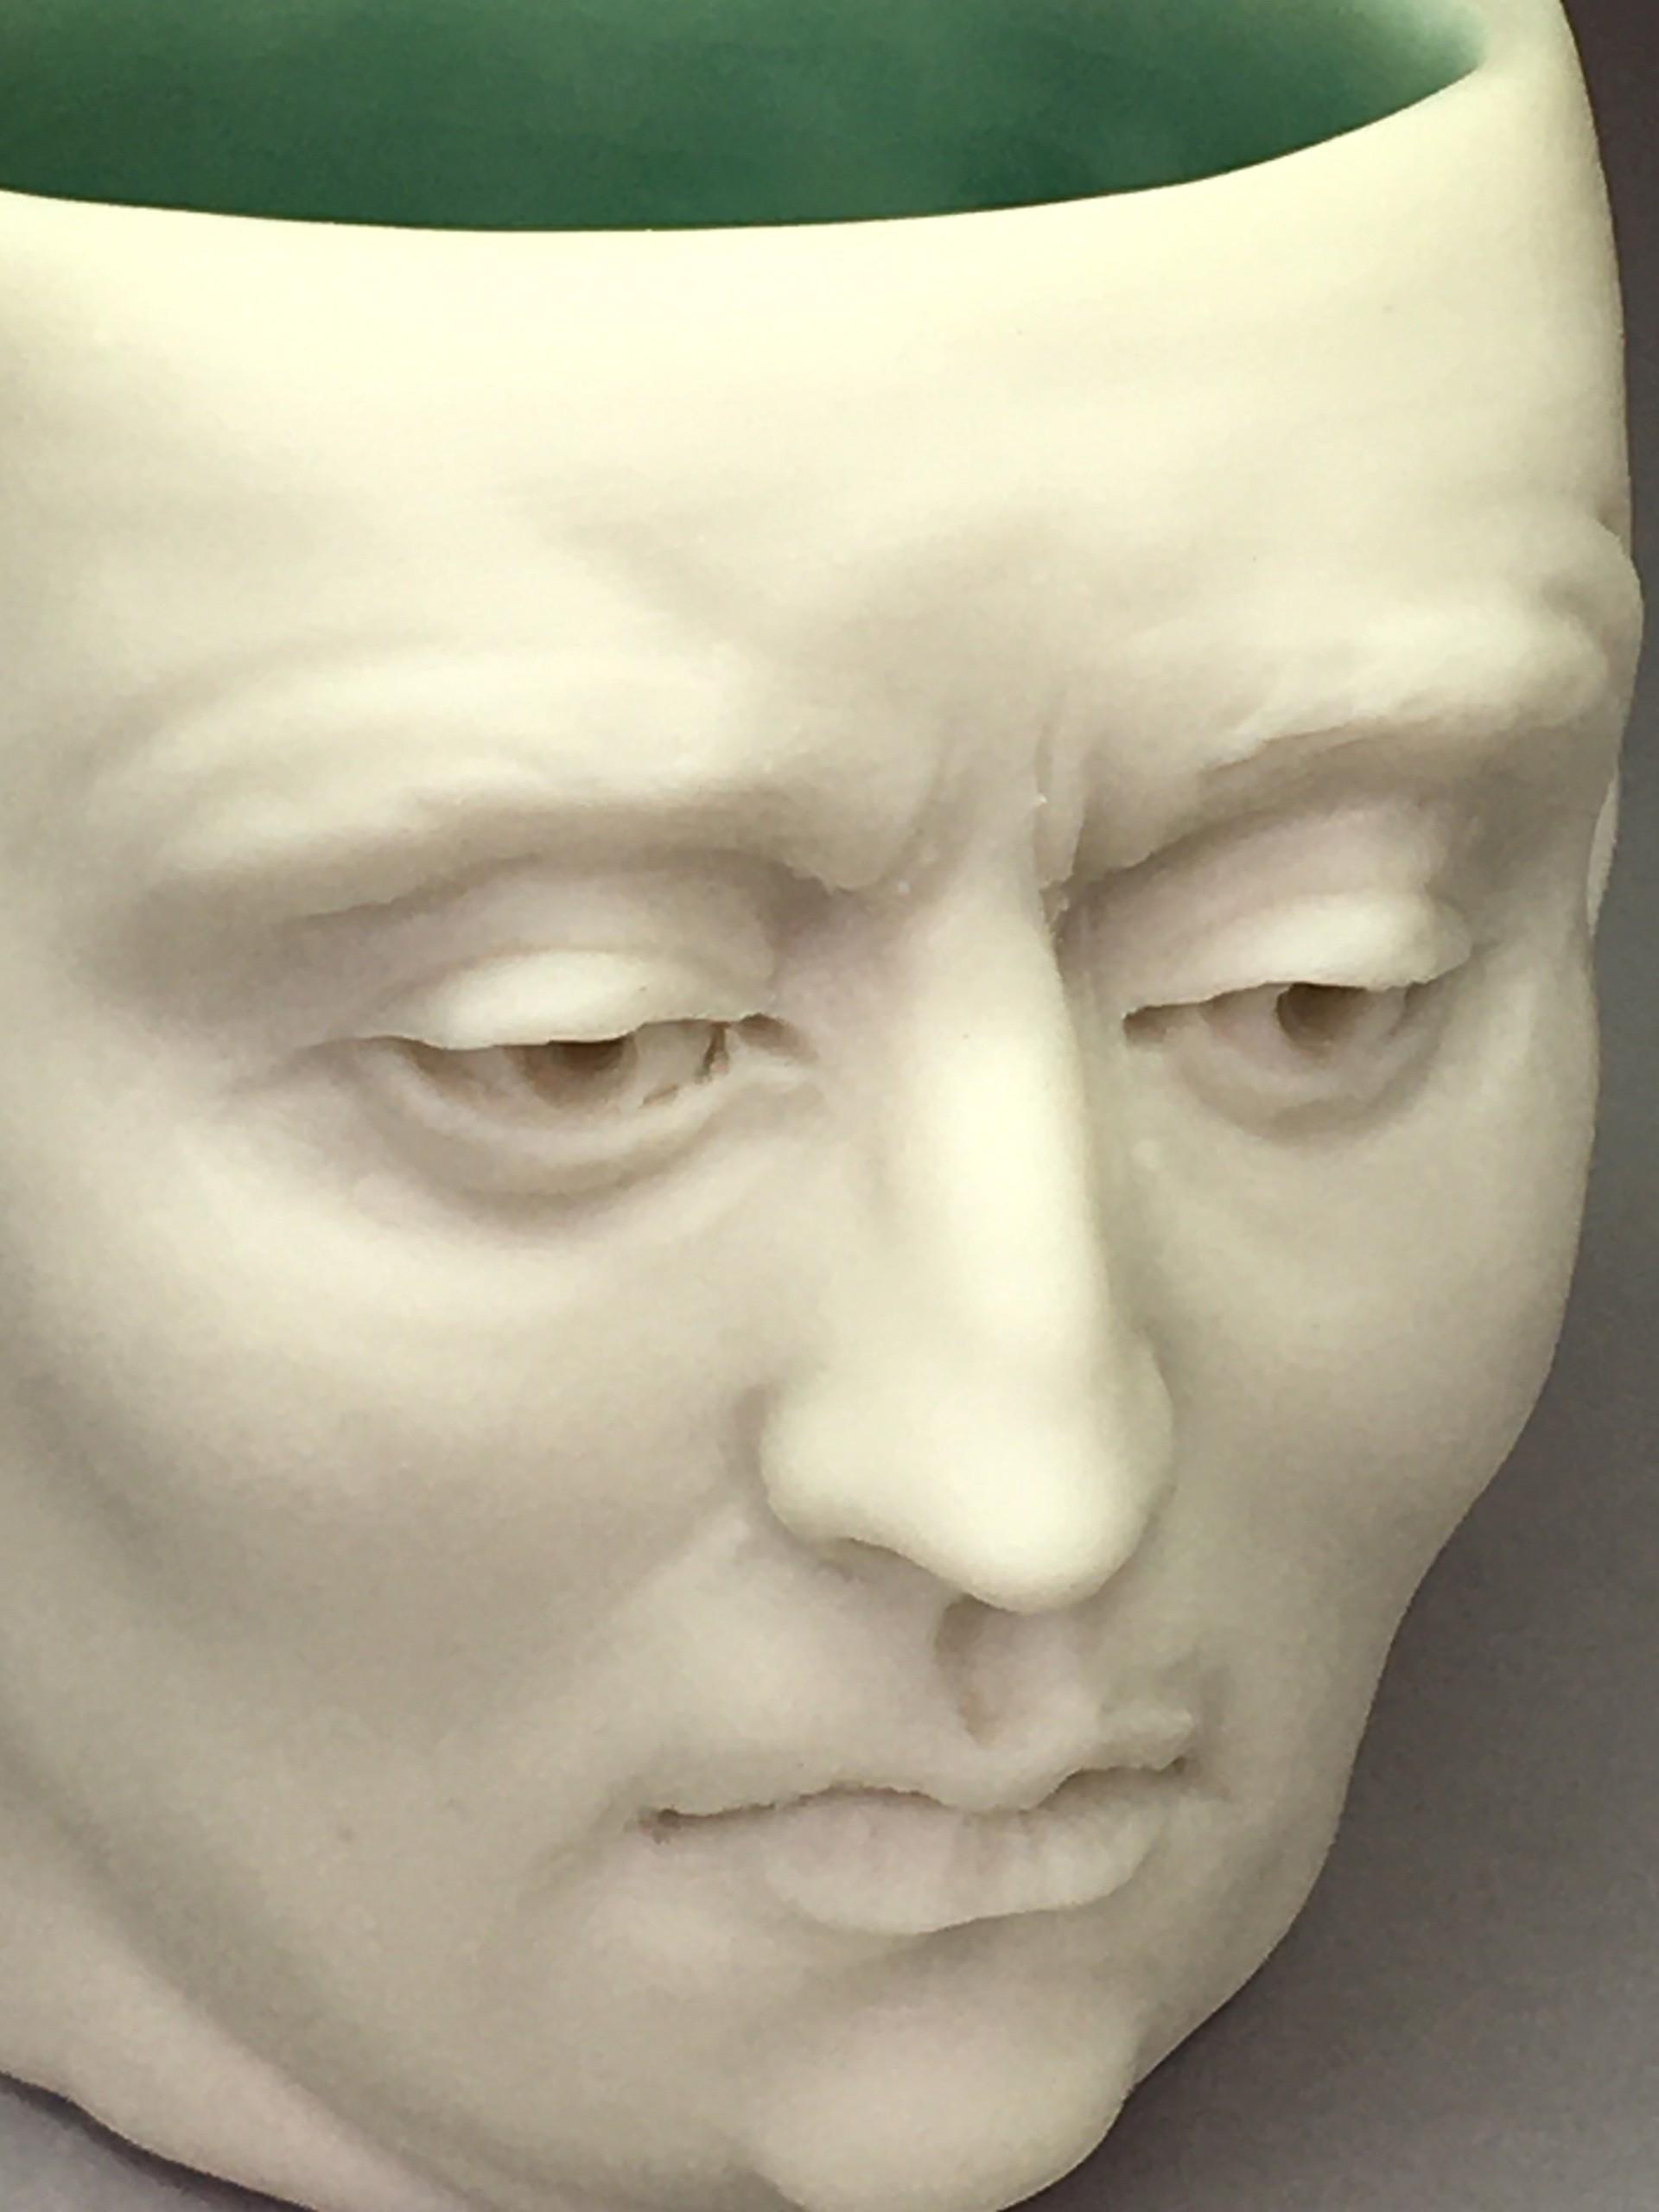 """Concerned Friend Shot Glass II"" (dark green interior, eyes open) by Adrian Arleo"